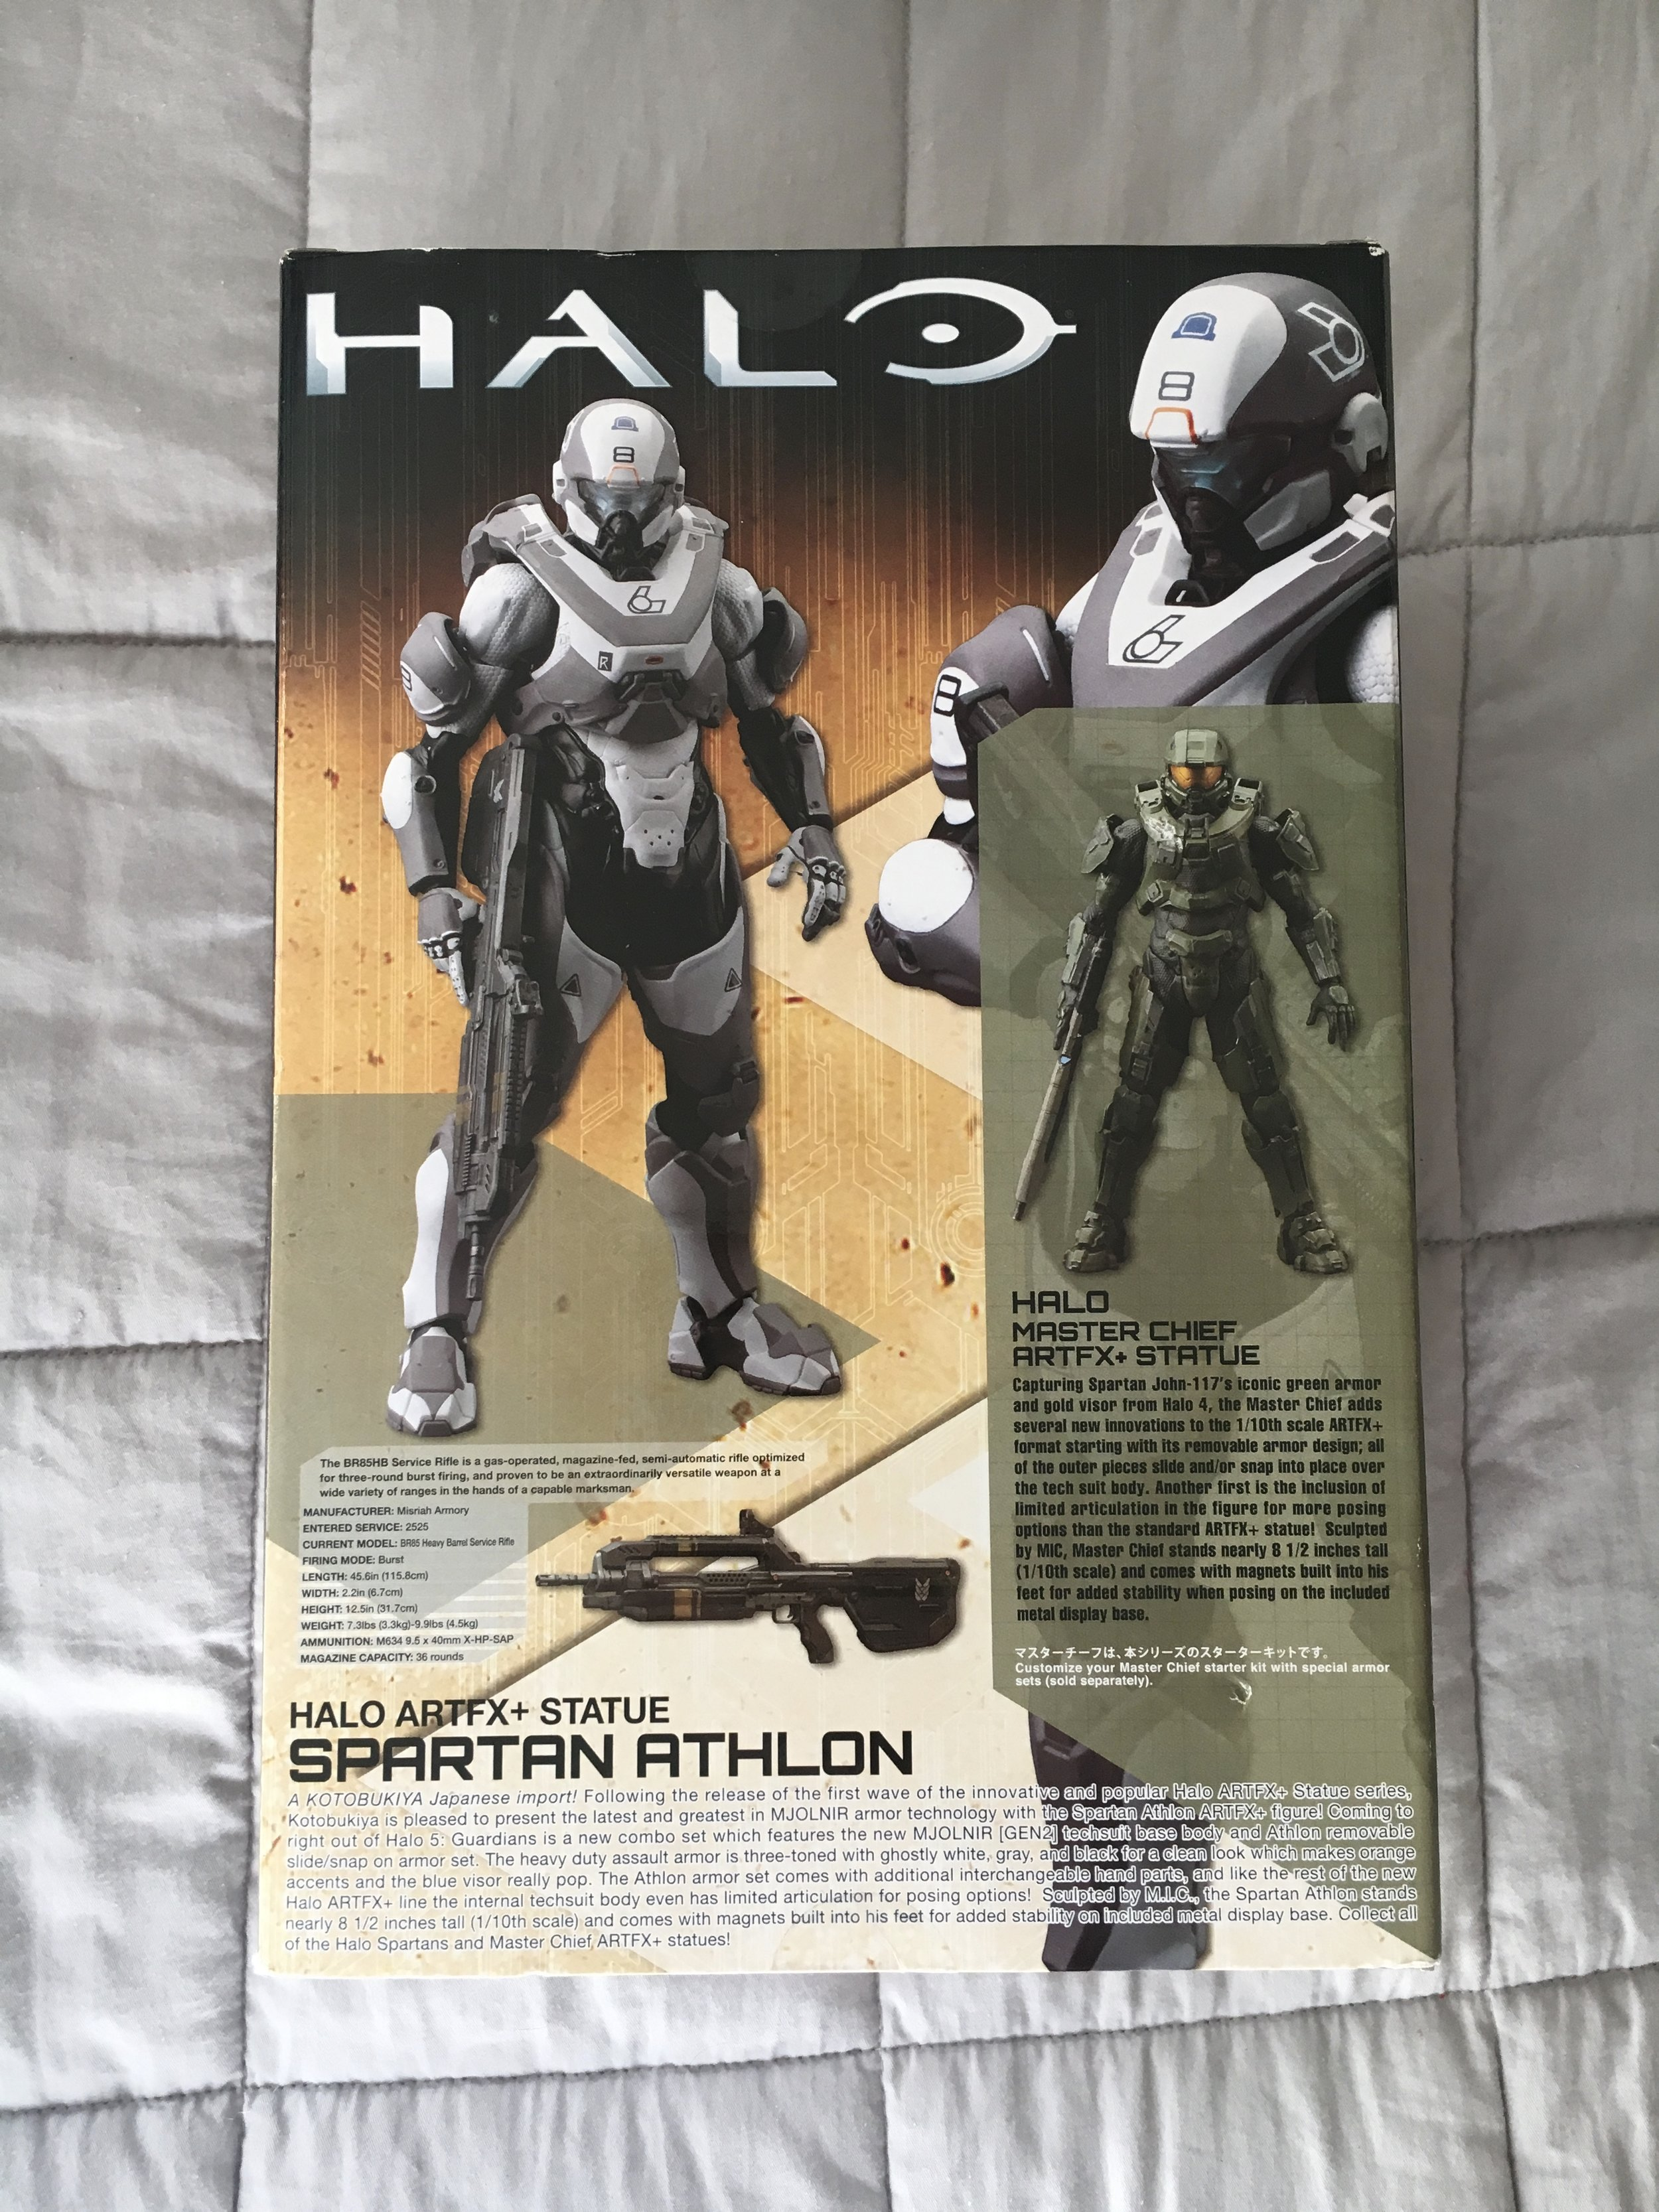 Athlon spartan back.JPG